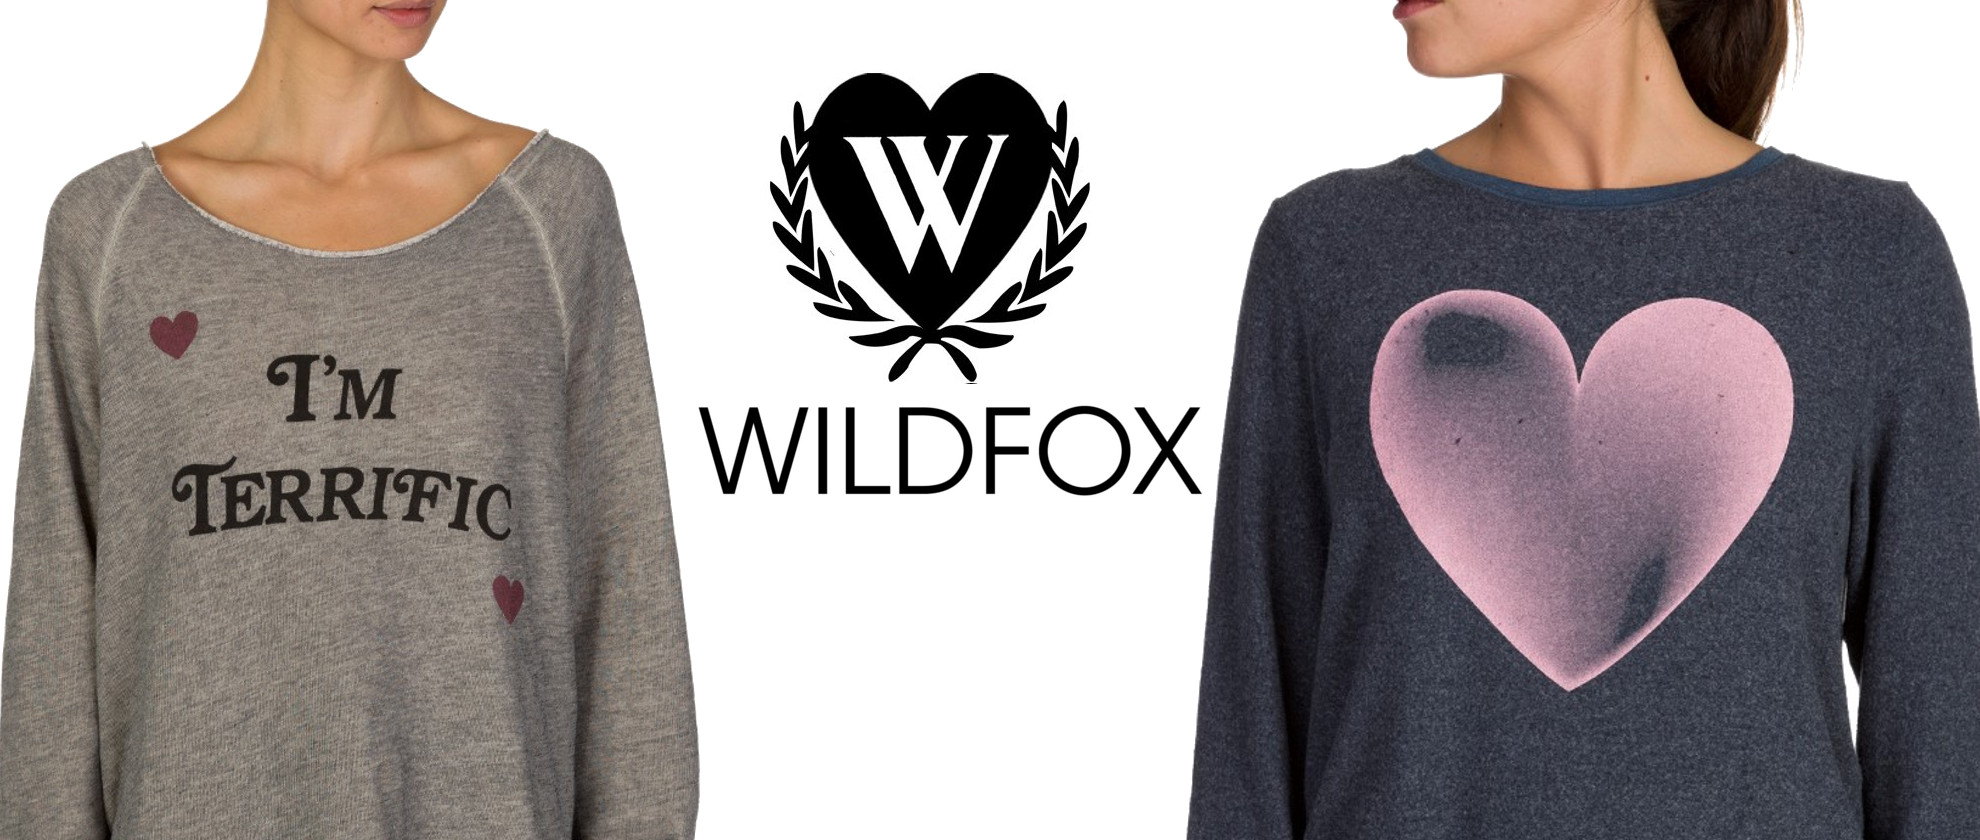 Brand Spotlight: Wildfox